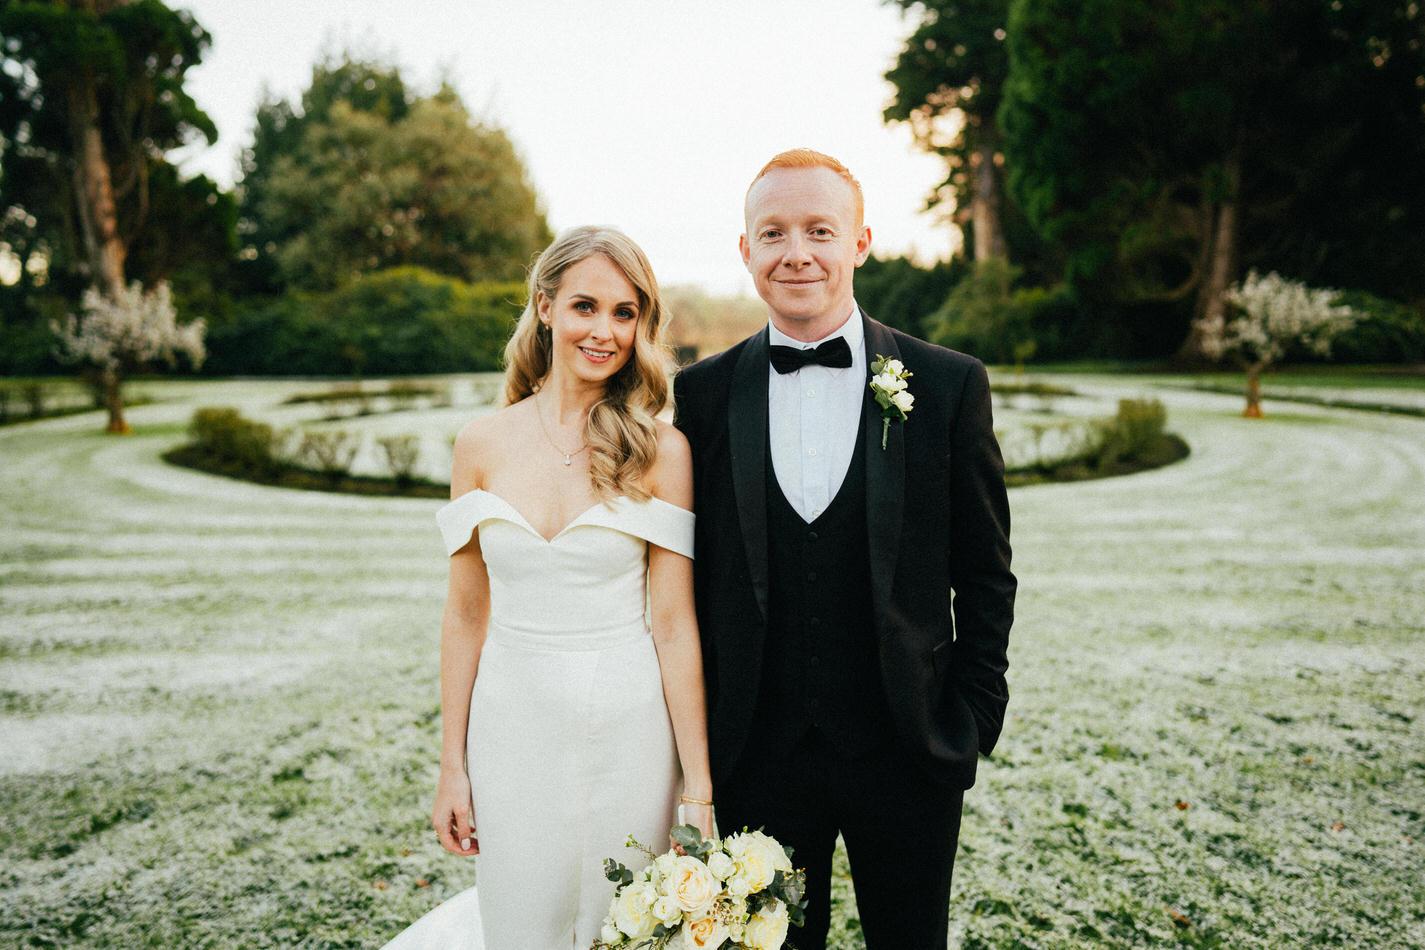 Castle-wedding-ireland-photos- 0202 144